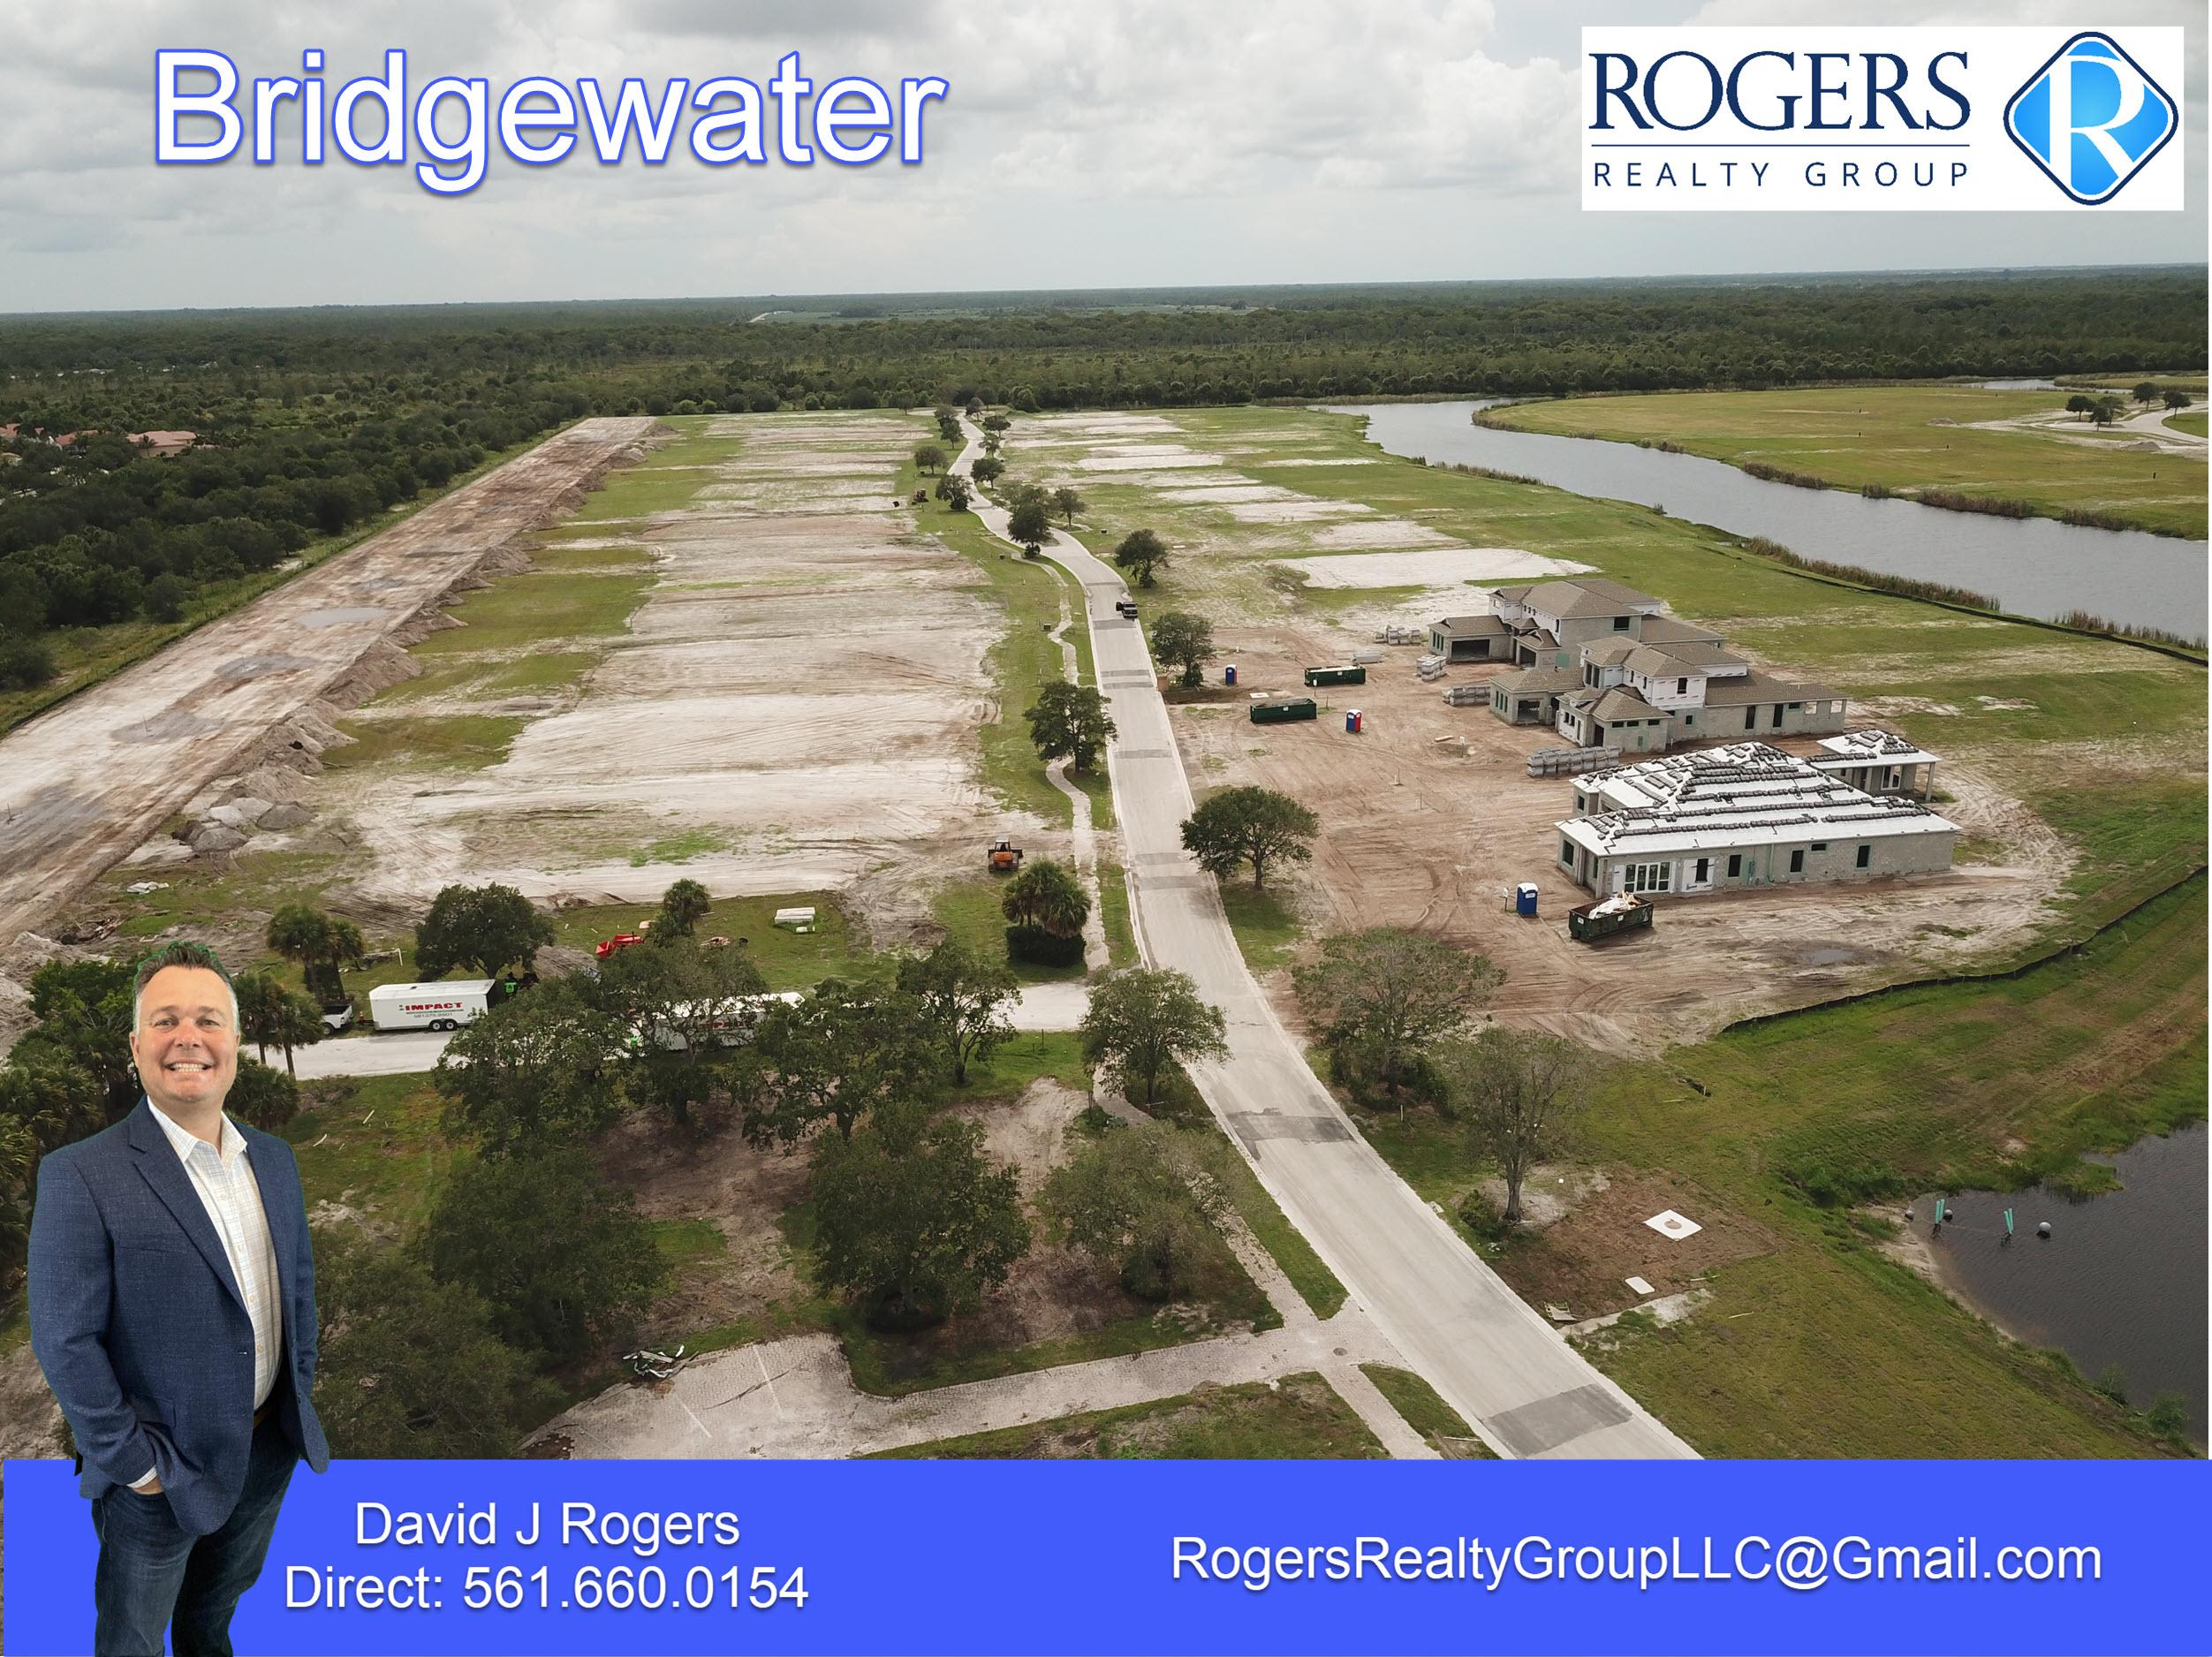 aerial view of bridgewater jupiter florida community facing west towards I95 & Florida Turnpike